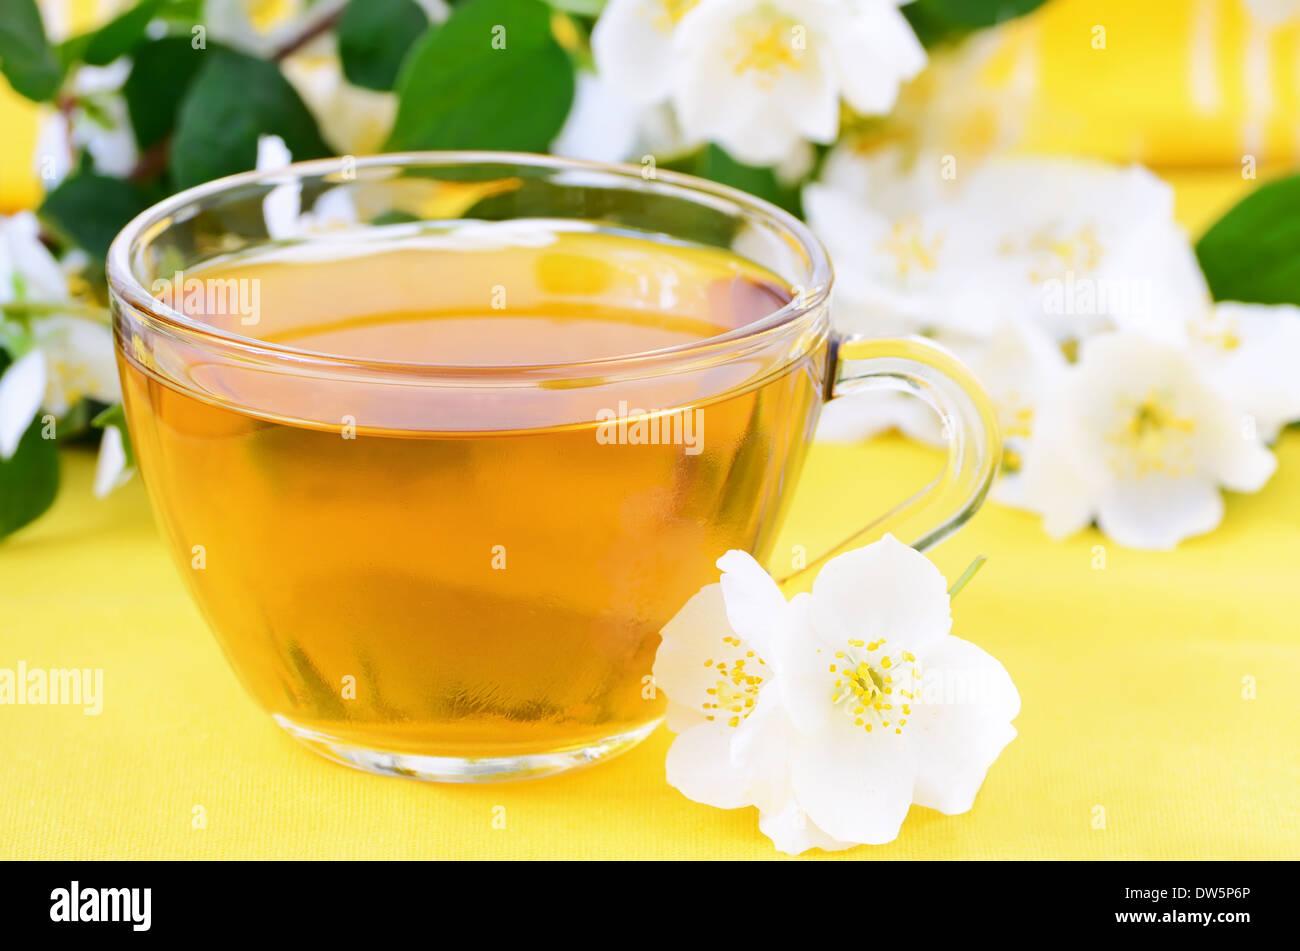 Yellow jasmine flower stock photos yellow jasmine flower stock herbal tea with jasmine flowers stock image izmirmasajfo Images